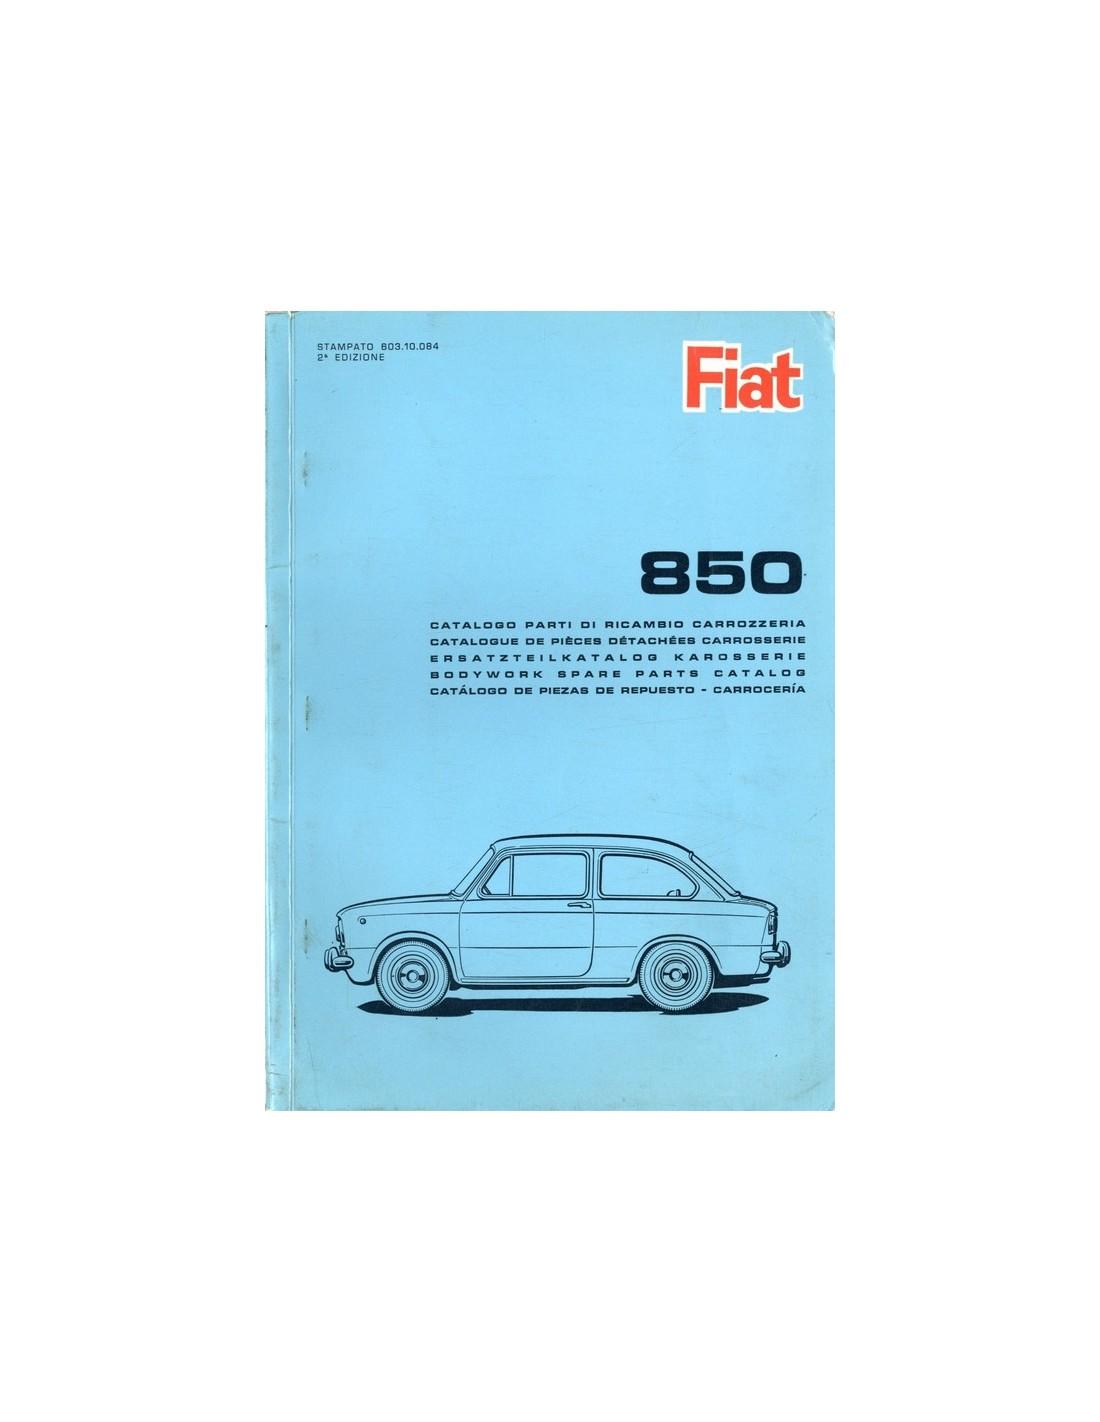 1965 Fiat 850 Spare Parts Catalog